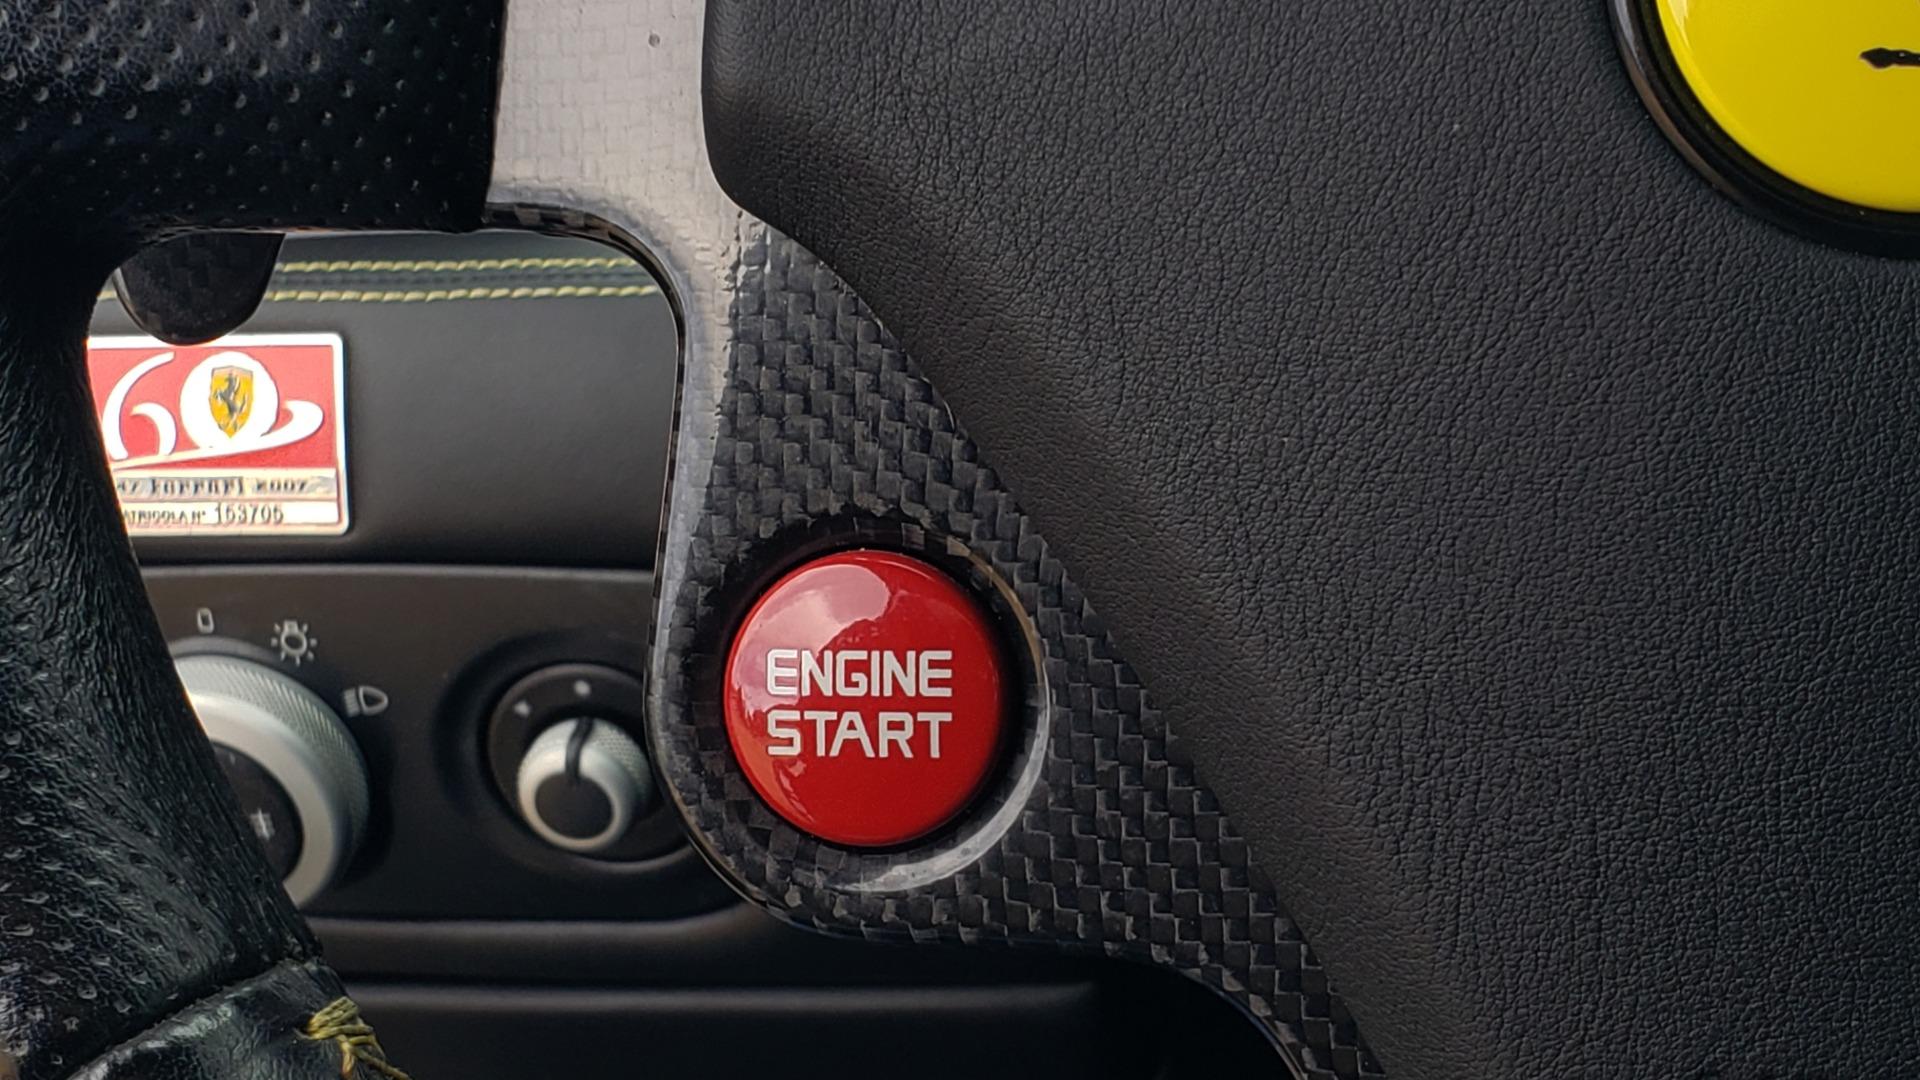 Used 2007 Ferrari 599 GTB FIORANO HGTE / V12 / F1 TRANS / NAV / BOSE / CUSTOM WHEELS for sale $109,999 at Formula Imports in Charlotte NC 28227 25